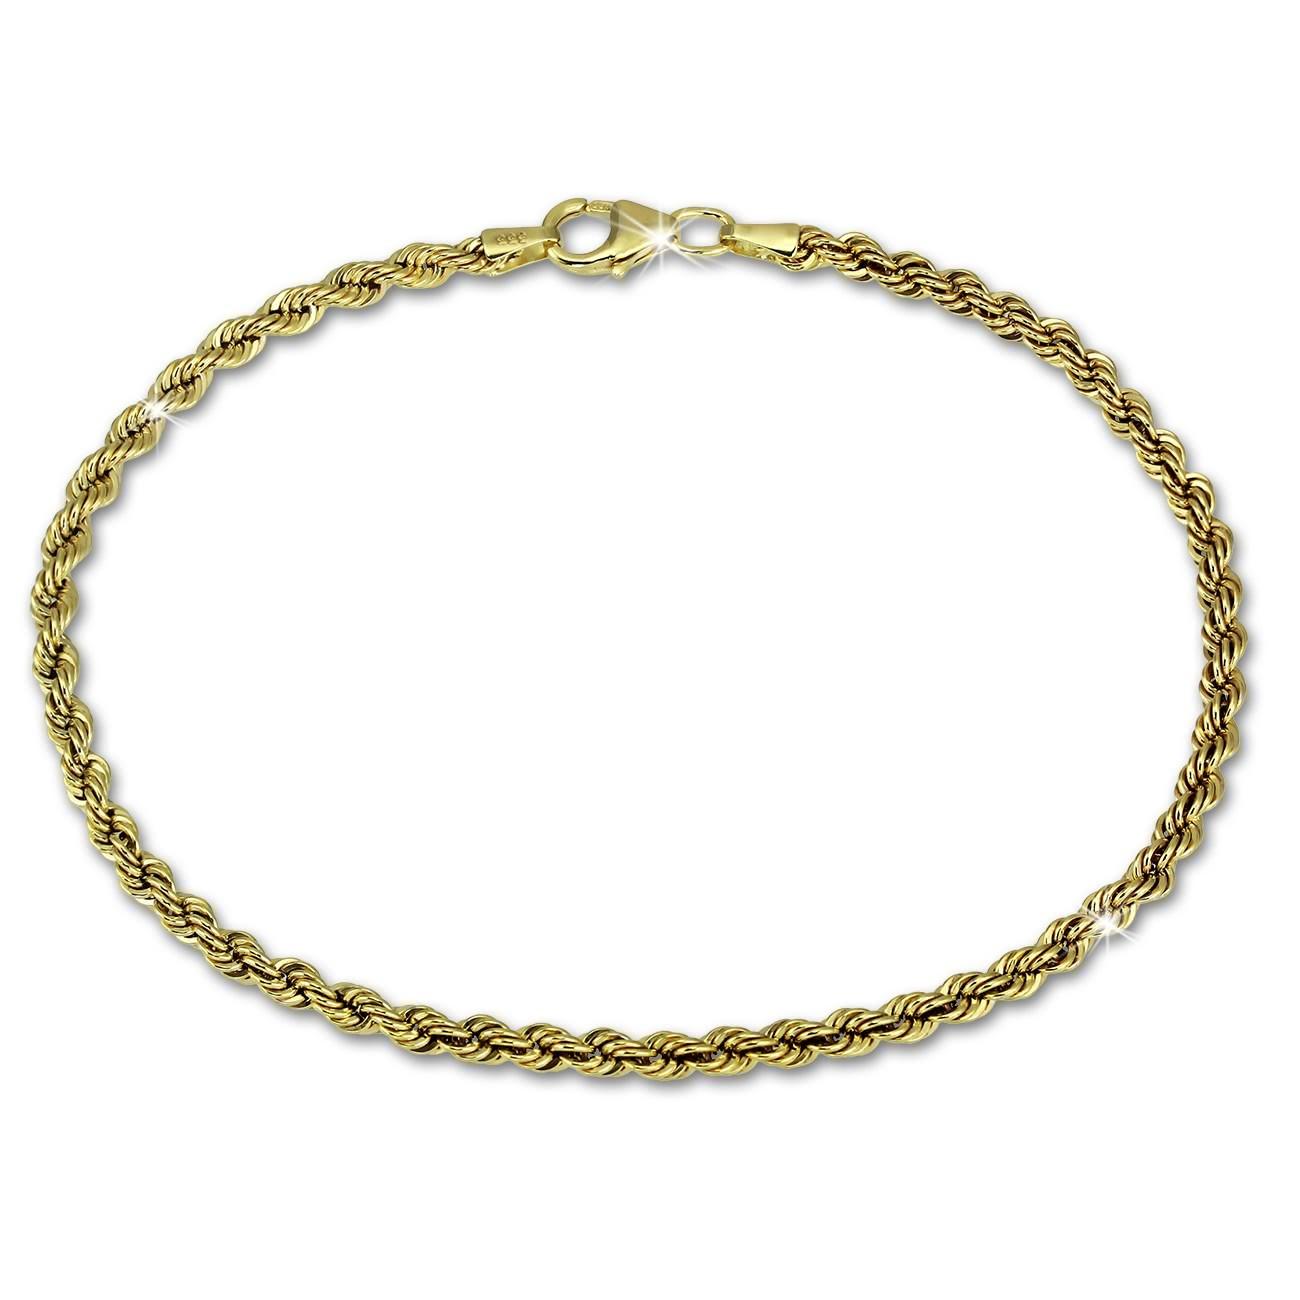 SilberDream Armband Kordel hohl 333 Gold 19cm 8 Karat GDA0319Y